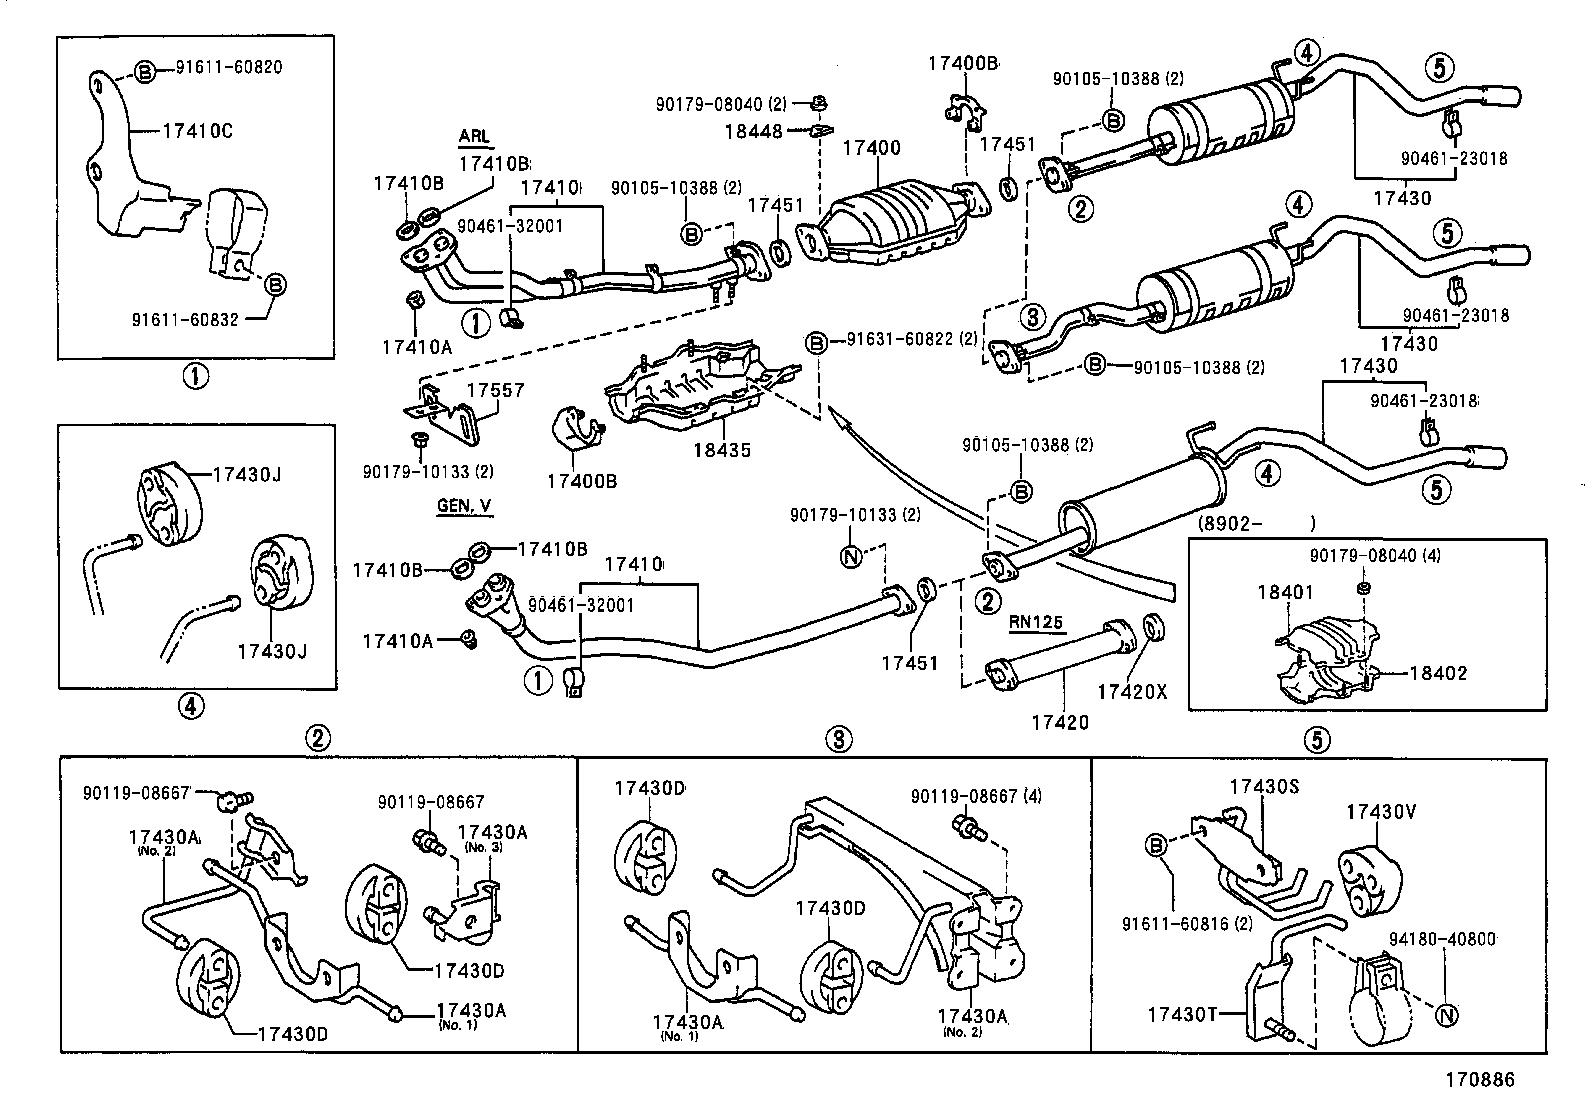 toyota rav4 exhaust system diagram wiring dual element hot water heater 4 runner truckrn85l trmssv tool engine fuel